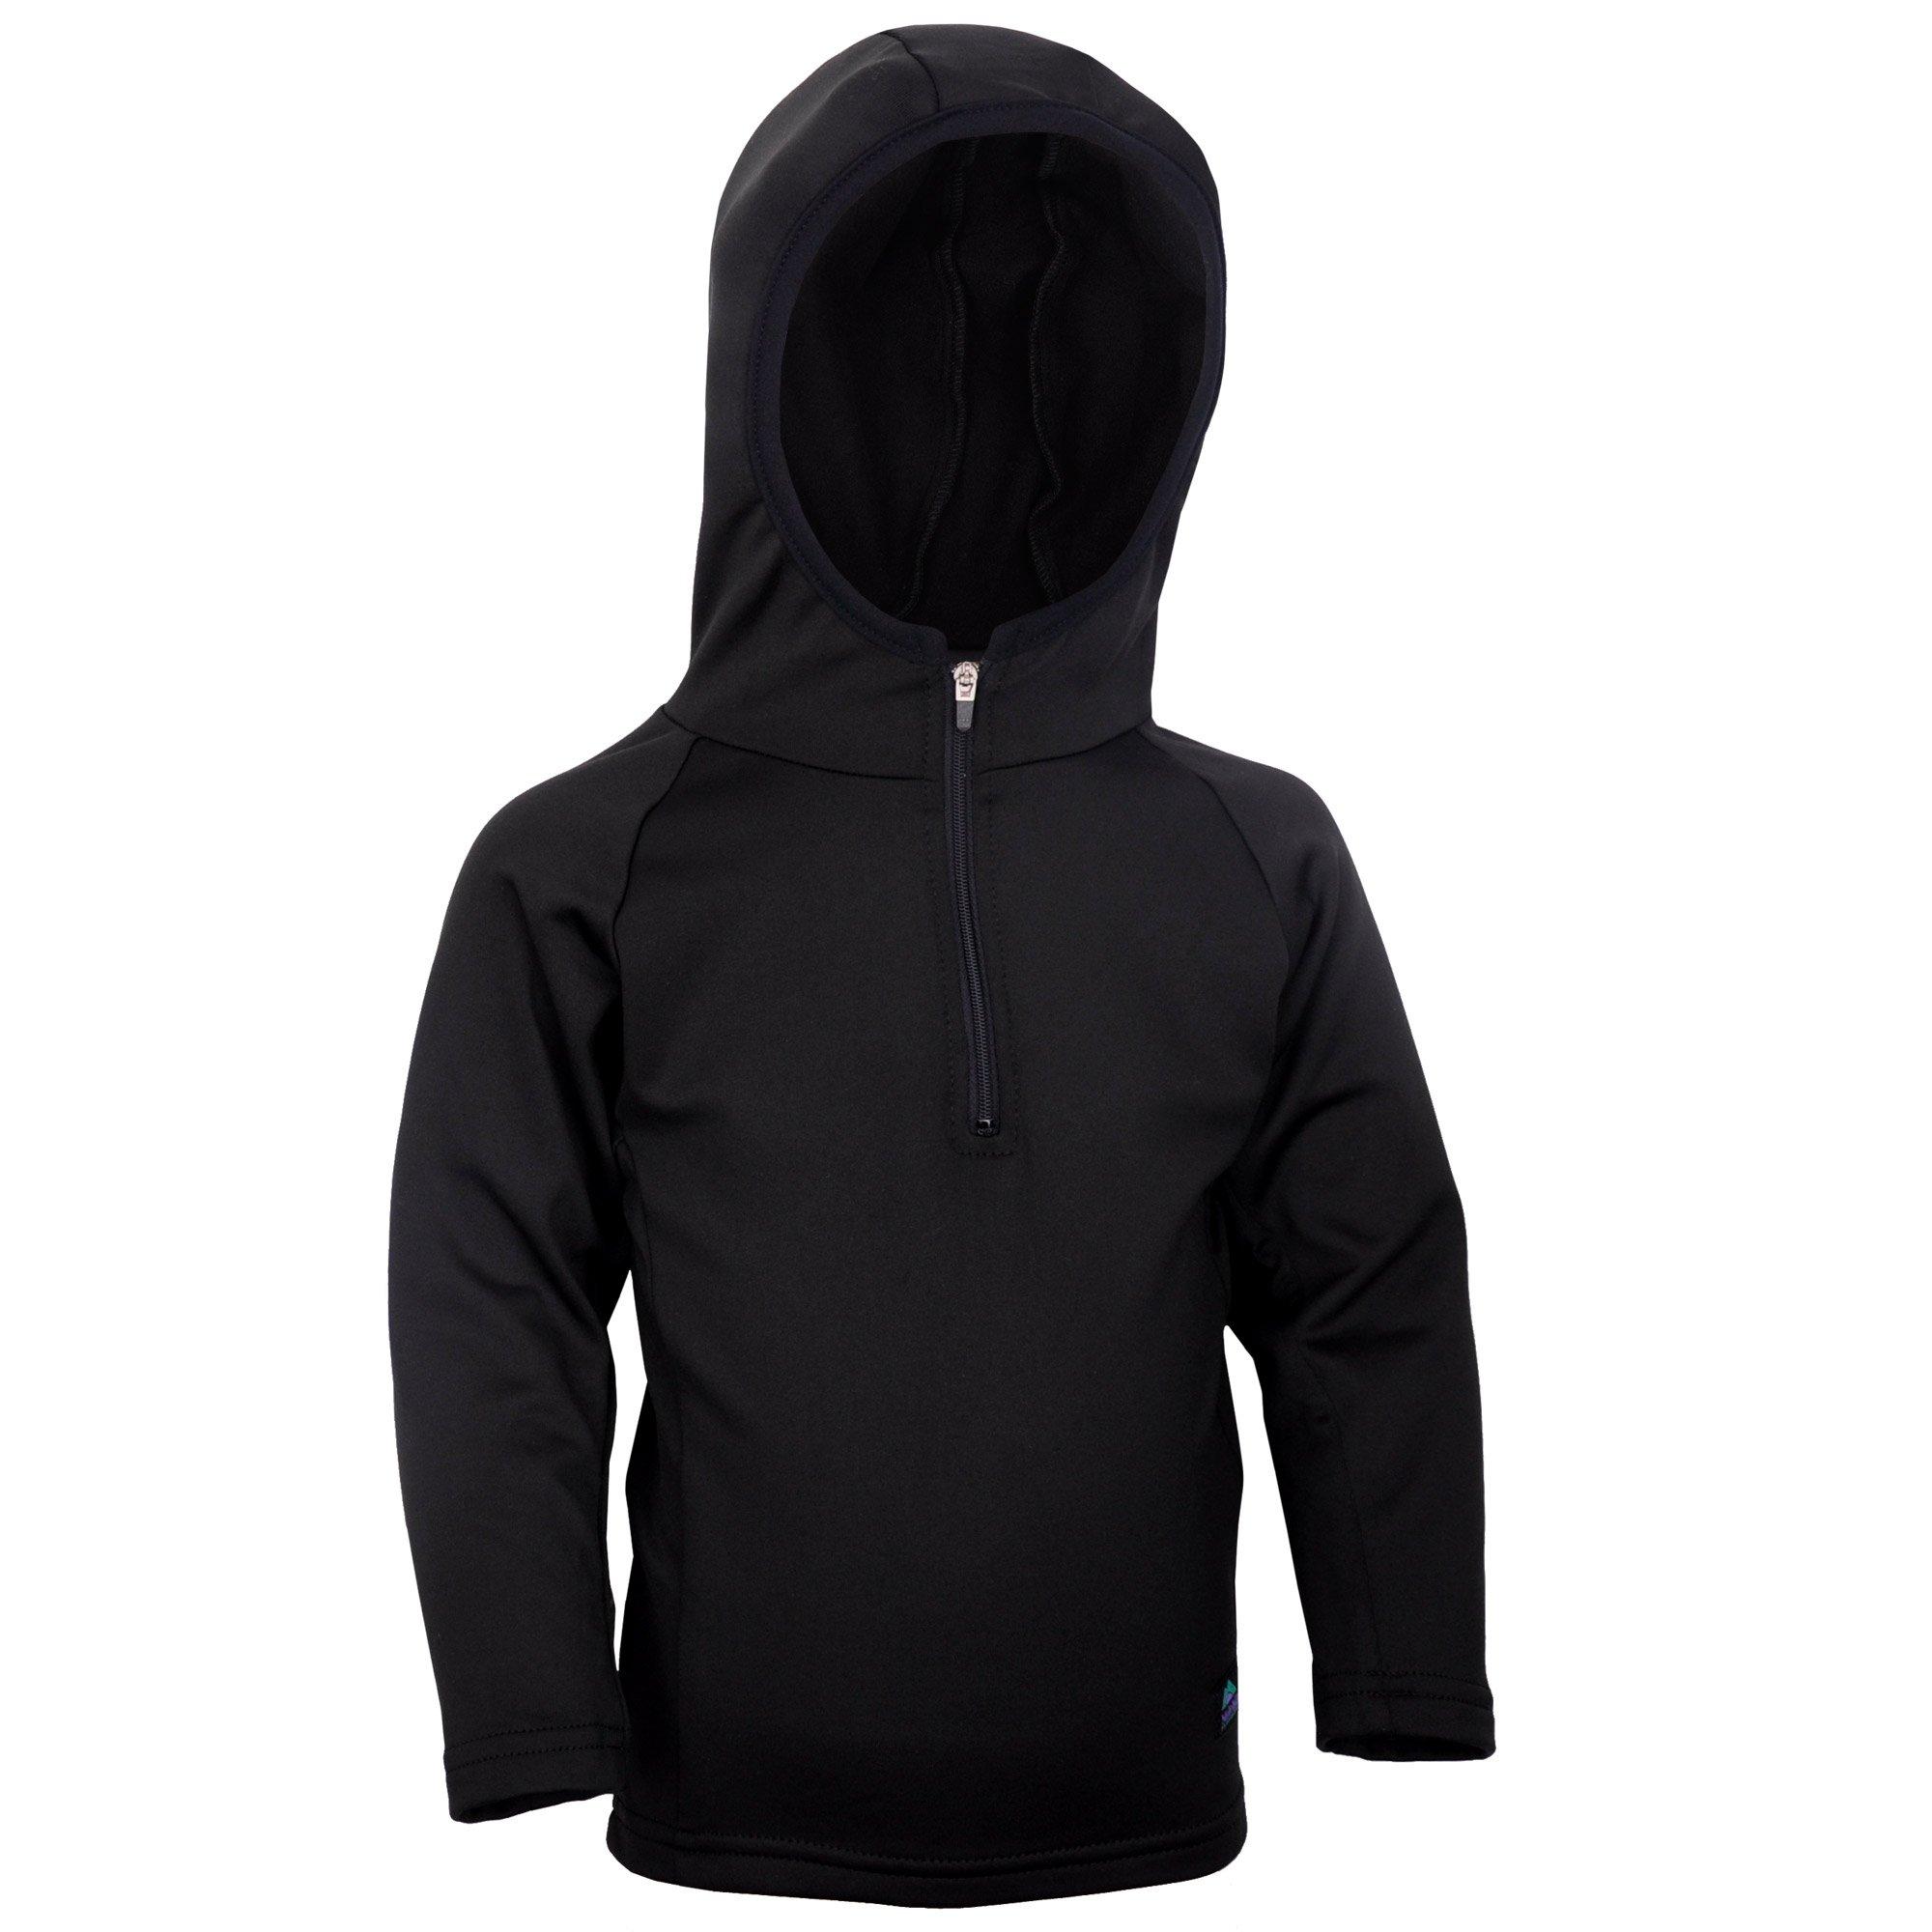 Molehill Kid's 4-Way Stretch Hoodie, Black, 3T by Molehill Mountain